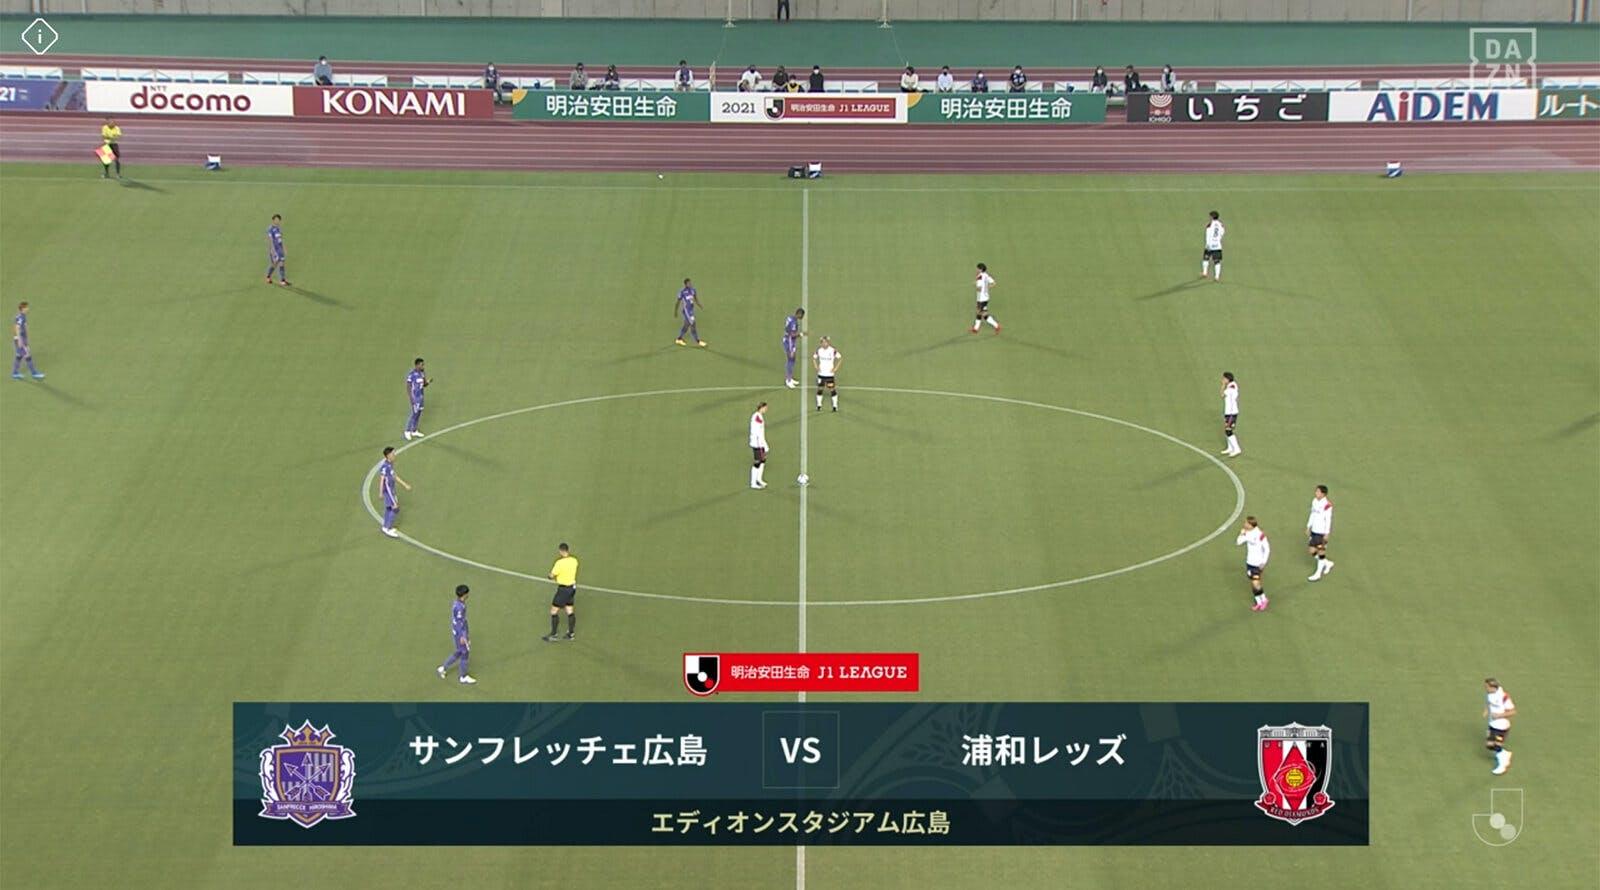 2021 Jリーグ 第16節 エディオンスタジアム広島 アウェー サンフレッチェ広島戦